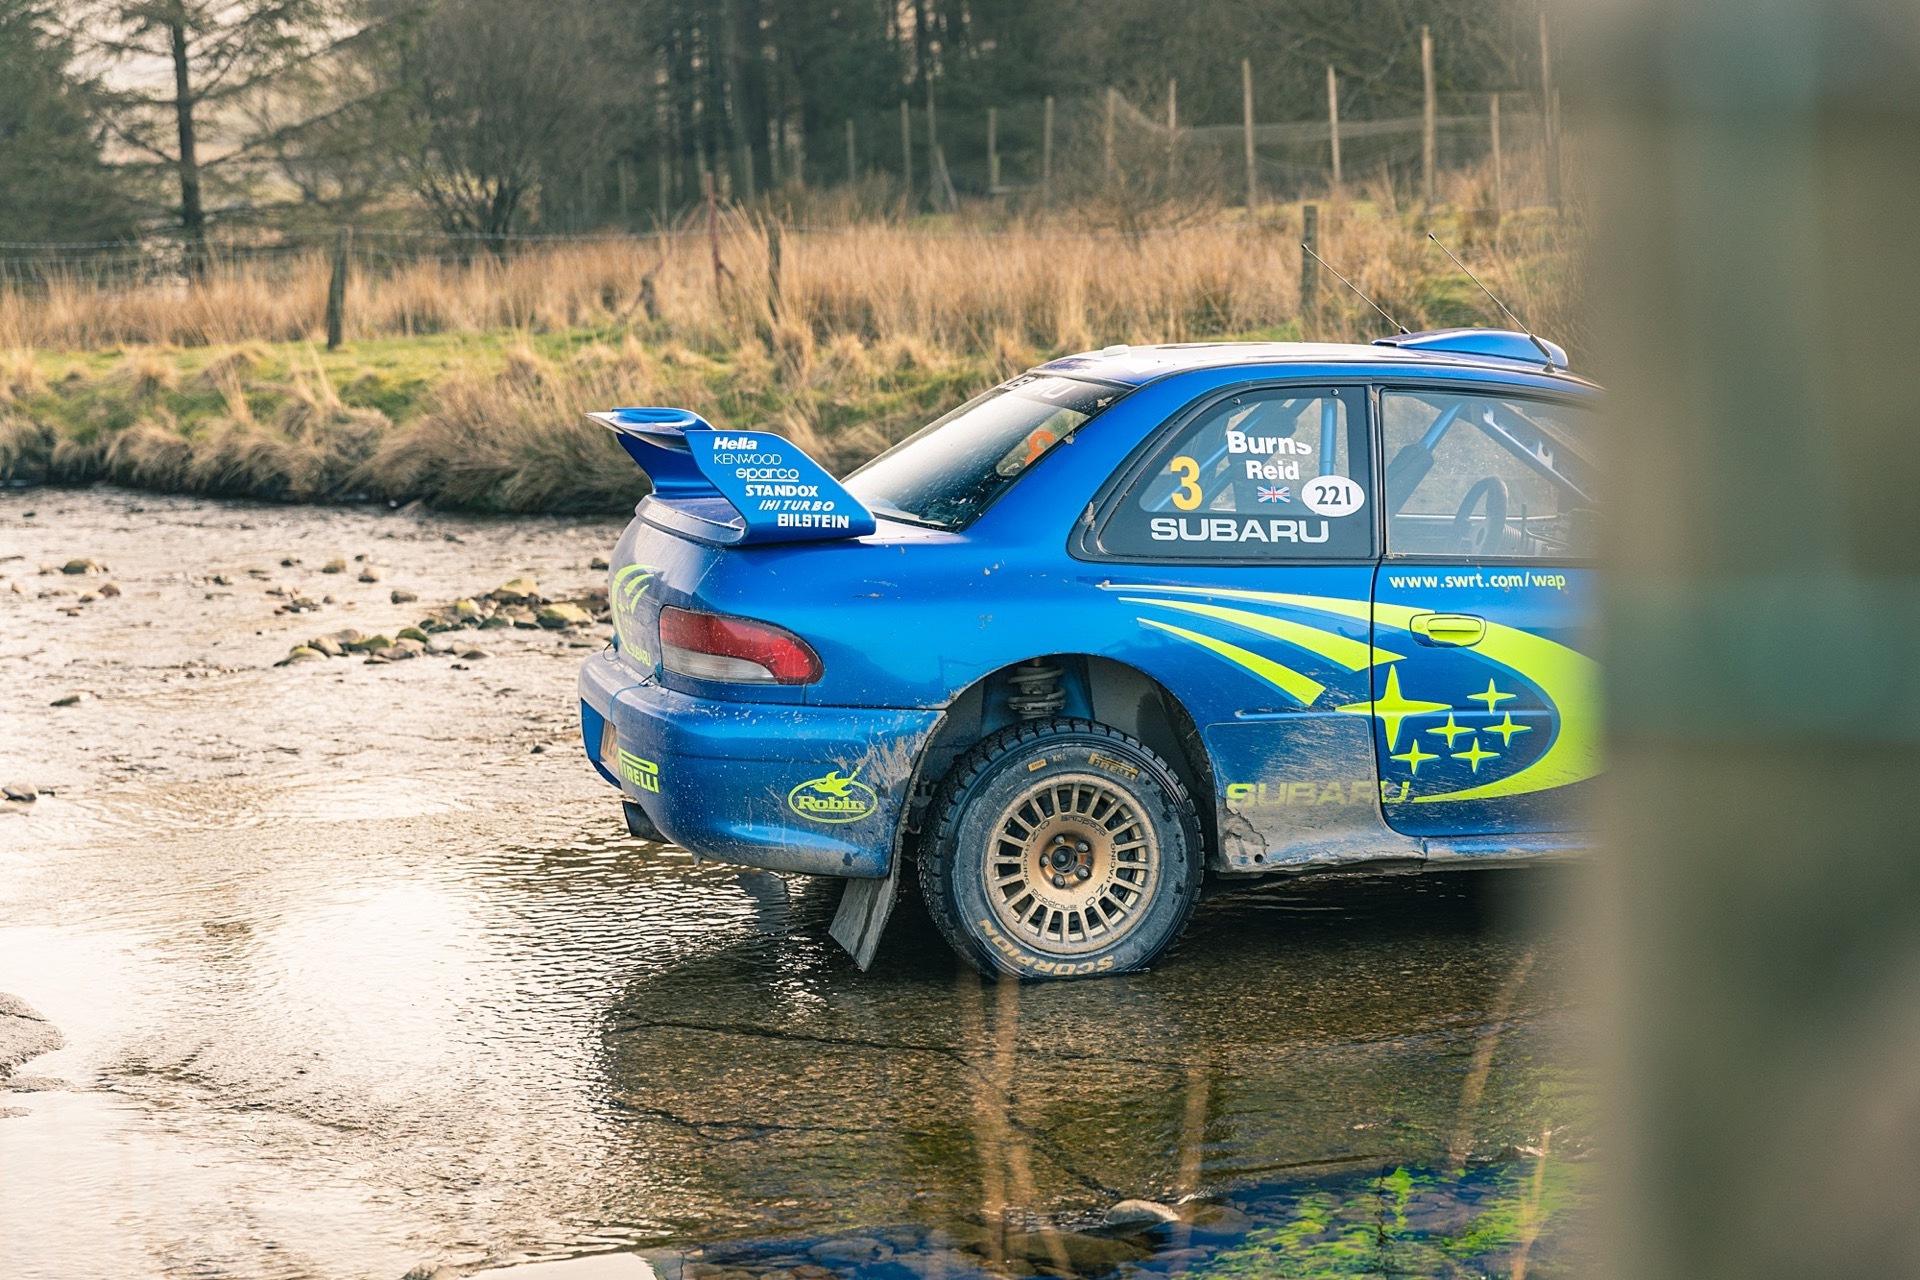 Richard_Burns_Subaru_Impreza_WRC_sale-0012